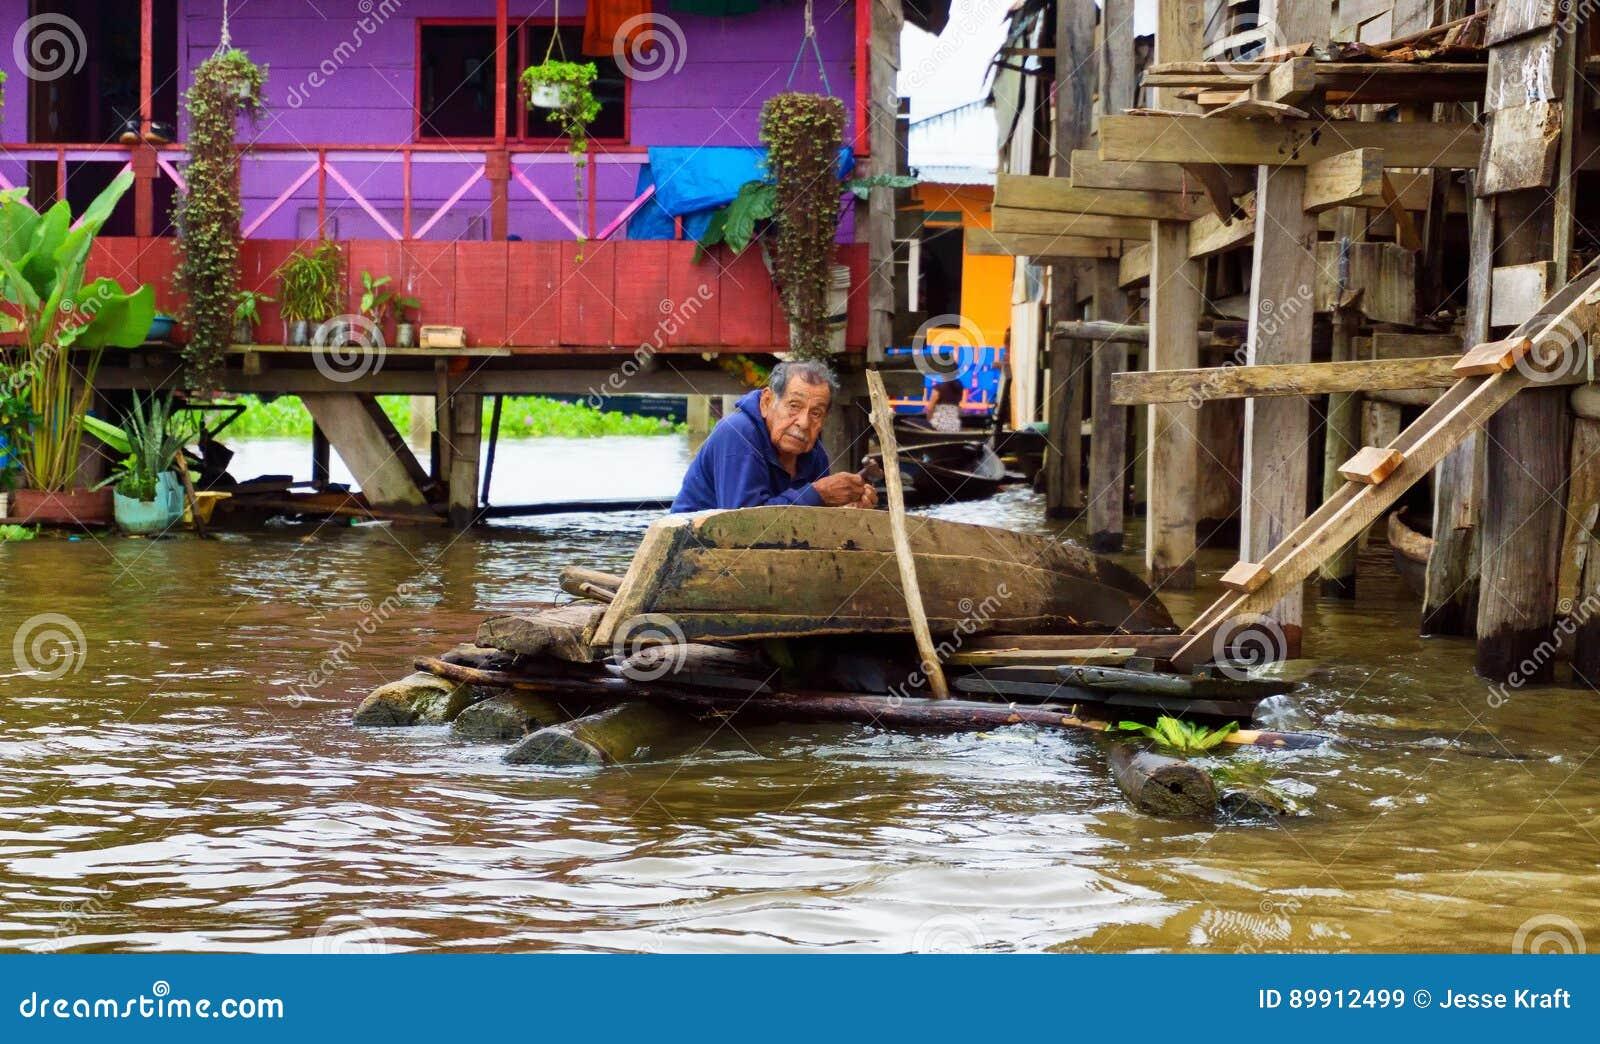 Elderly Man Fixing a Canoe